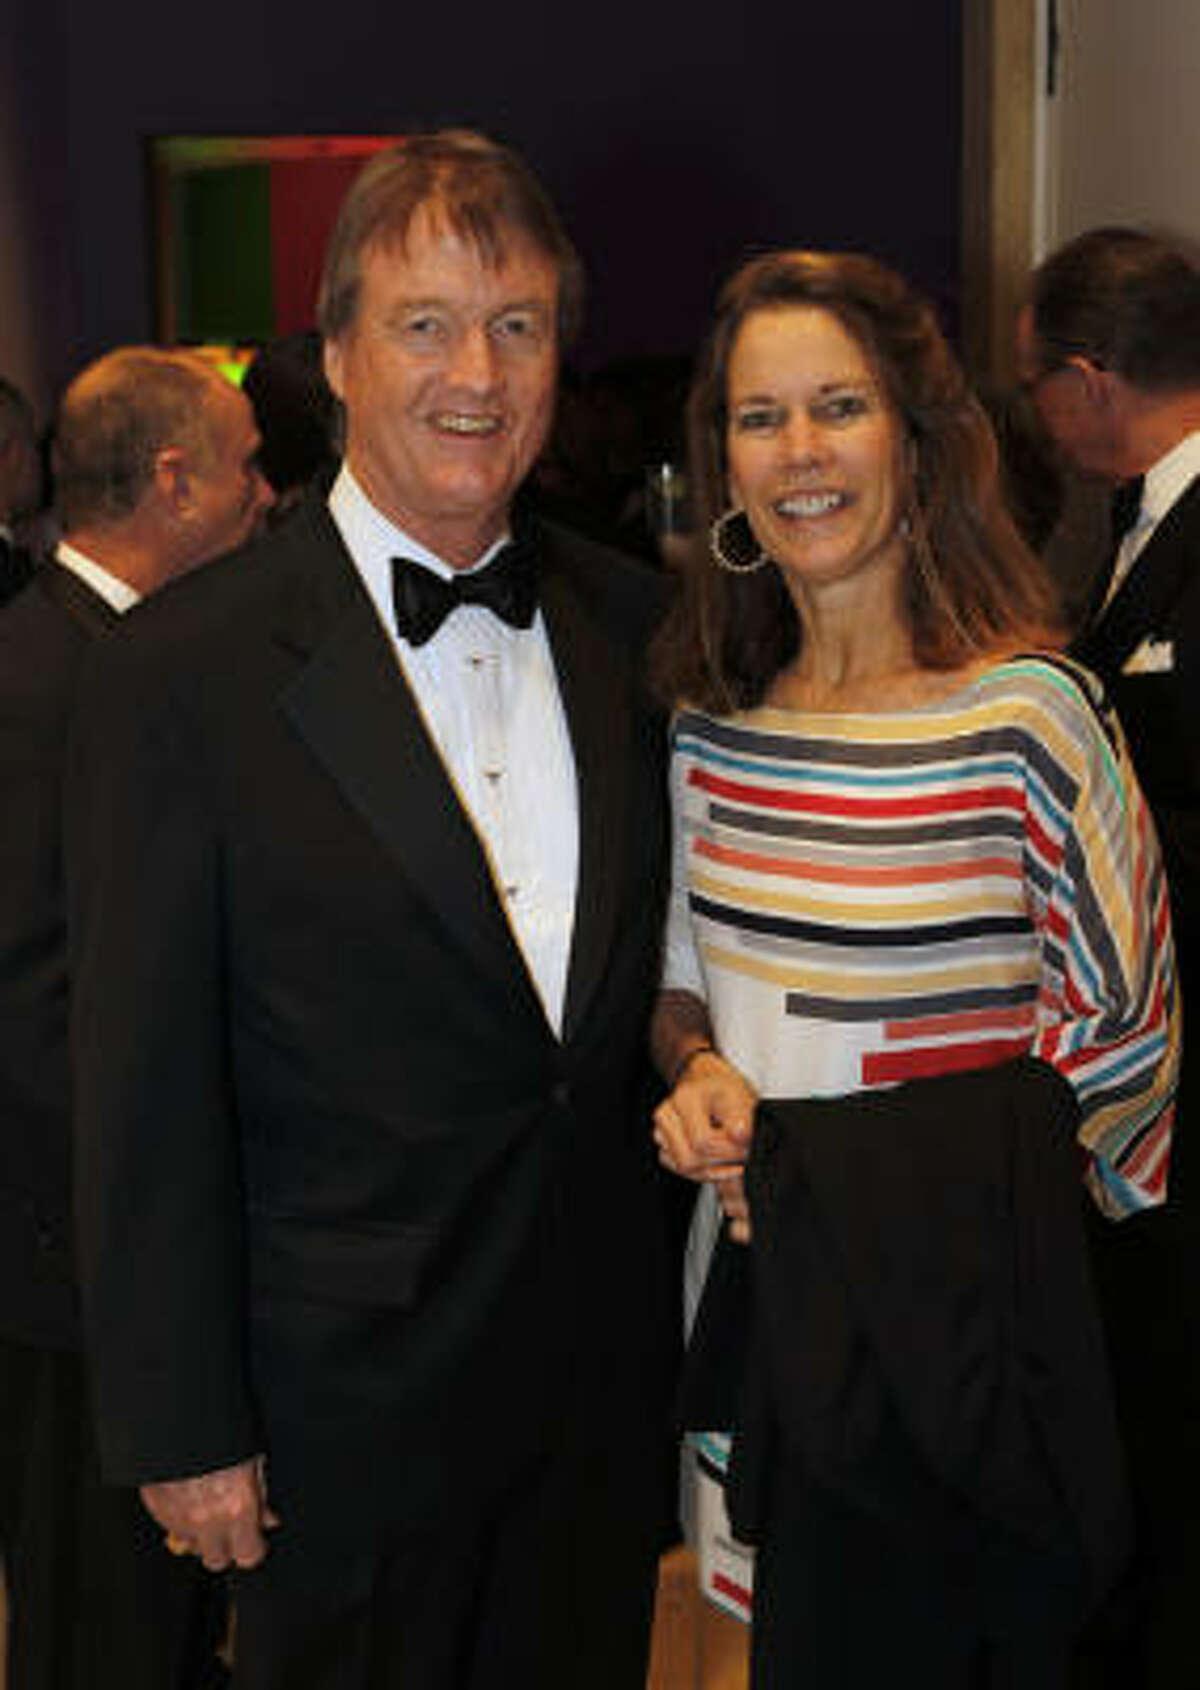 University of Texas at Austin president William Powers and his wife Kim Heilbrun